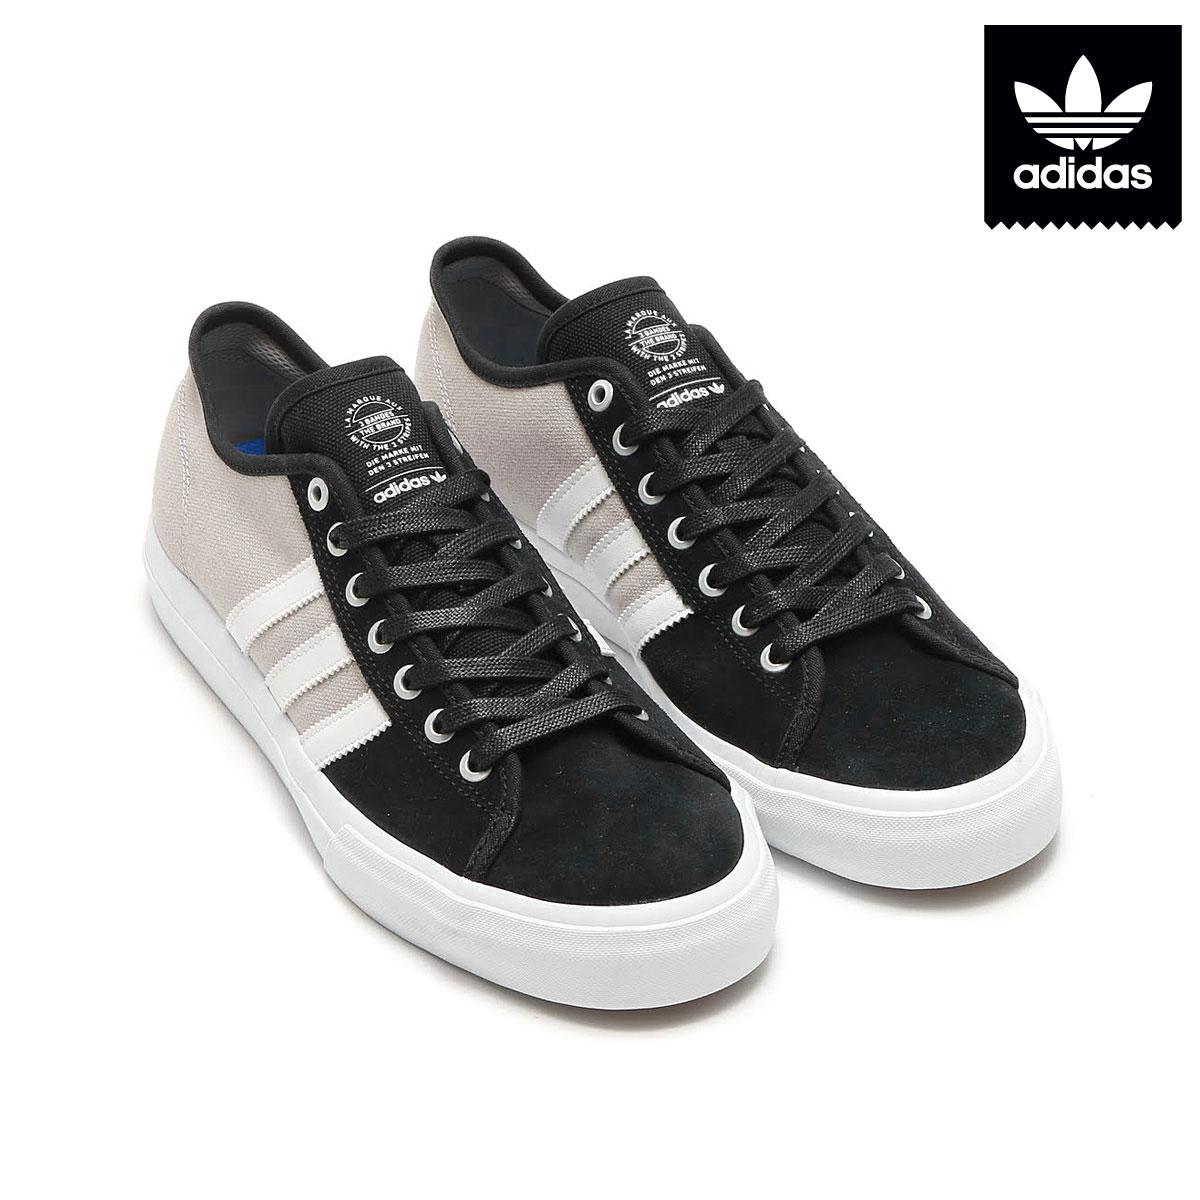 adidas Skateboarding MATCHCOURT RX(アディダス マッチコート RX)(Core Black/Running White/Customized)【メンズ スニーカー】17SS-I